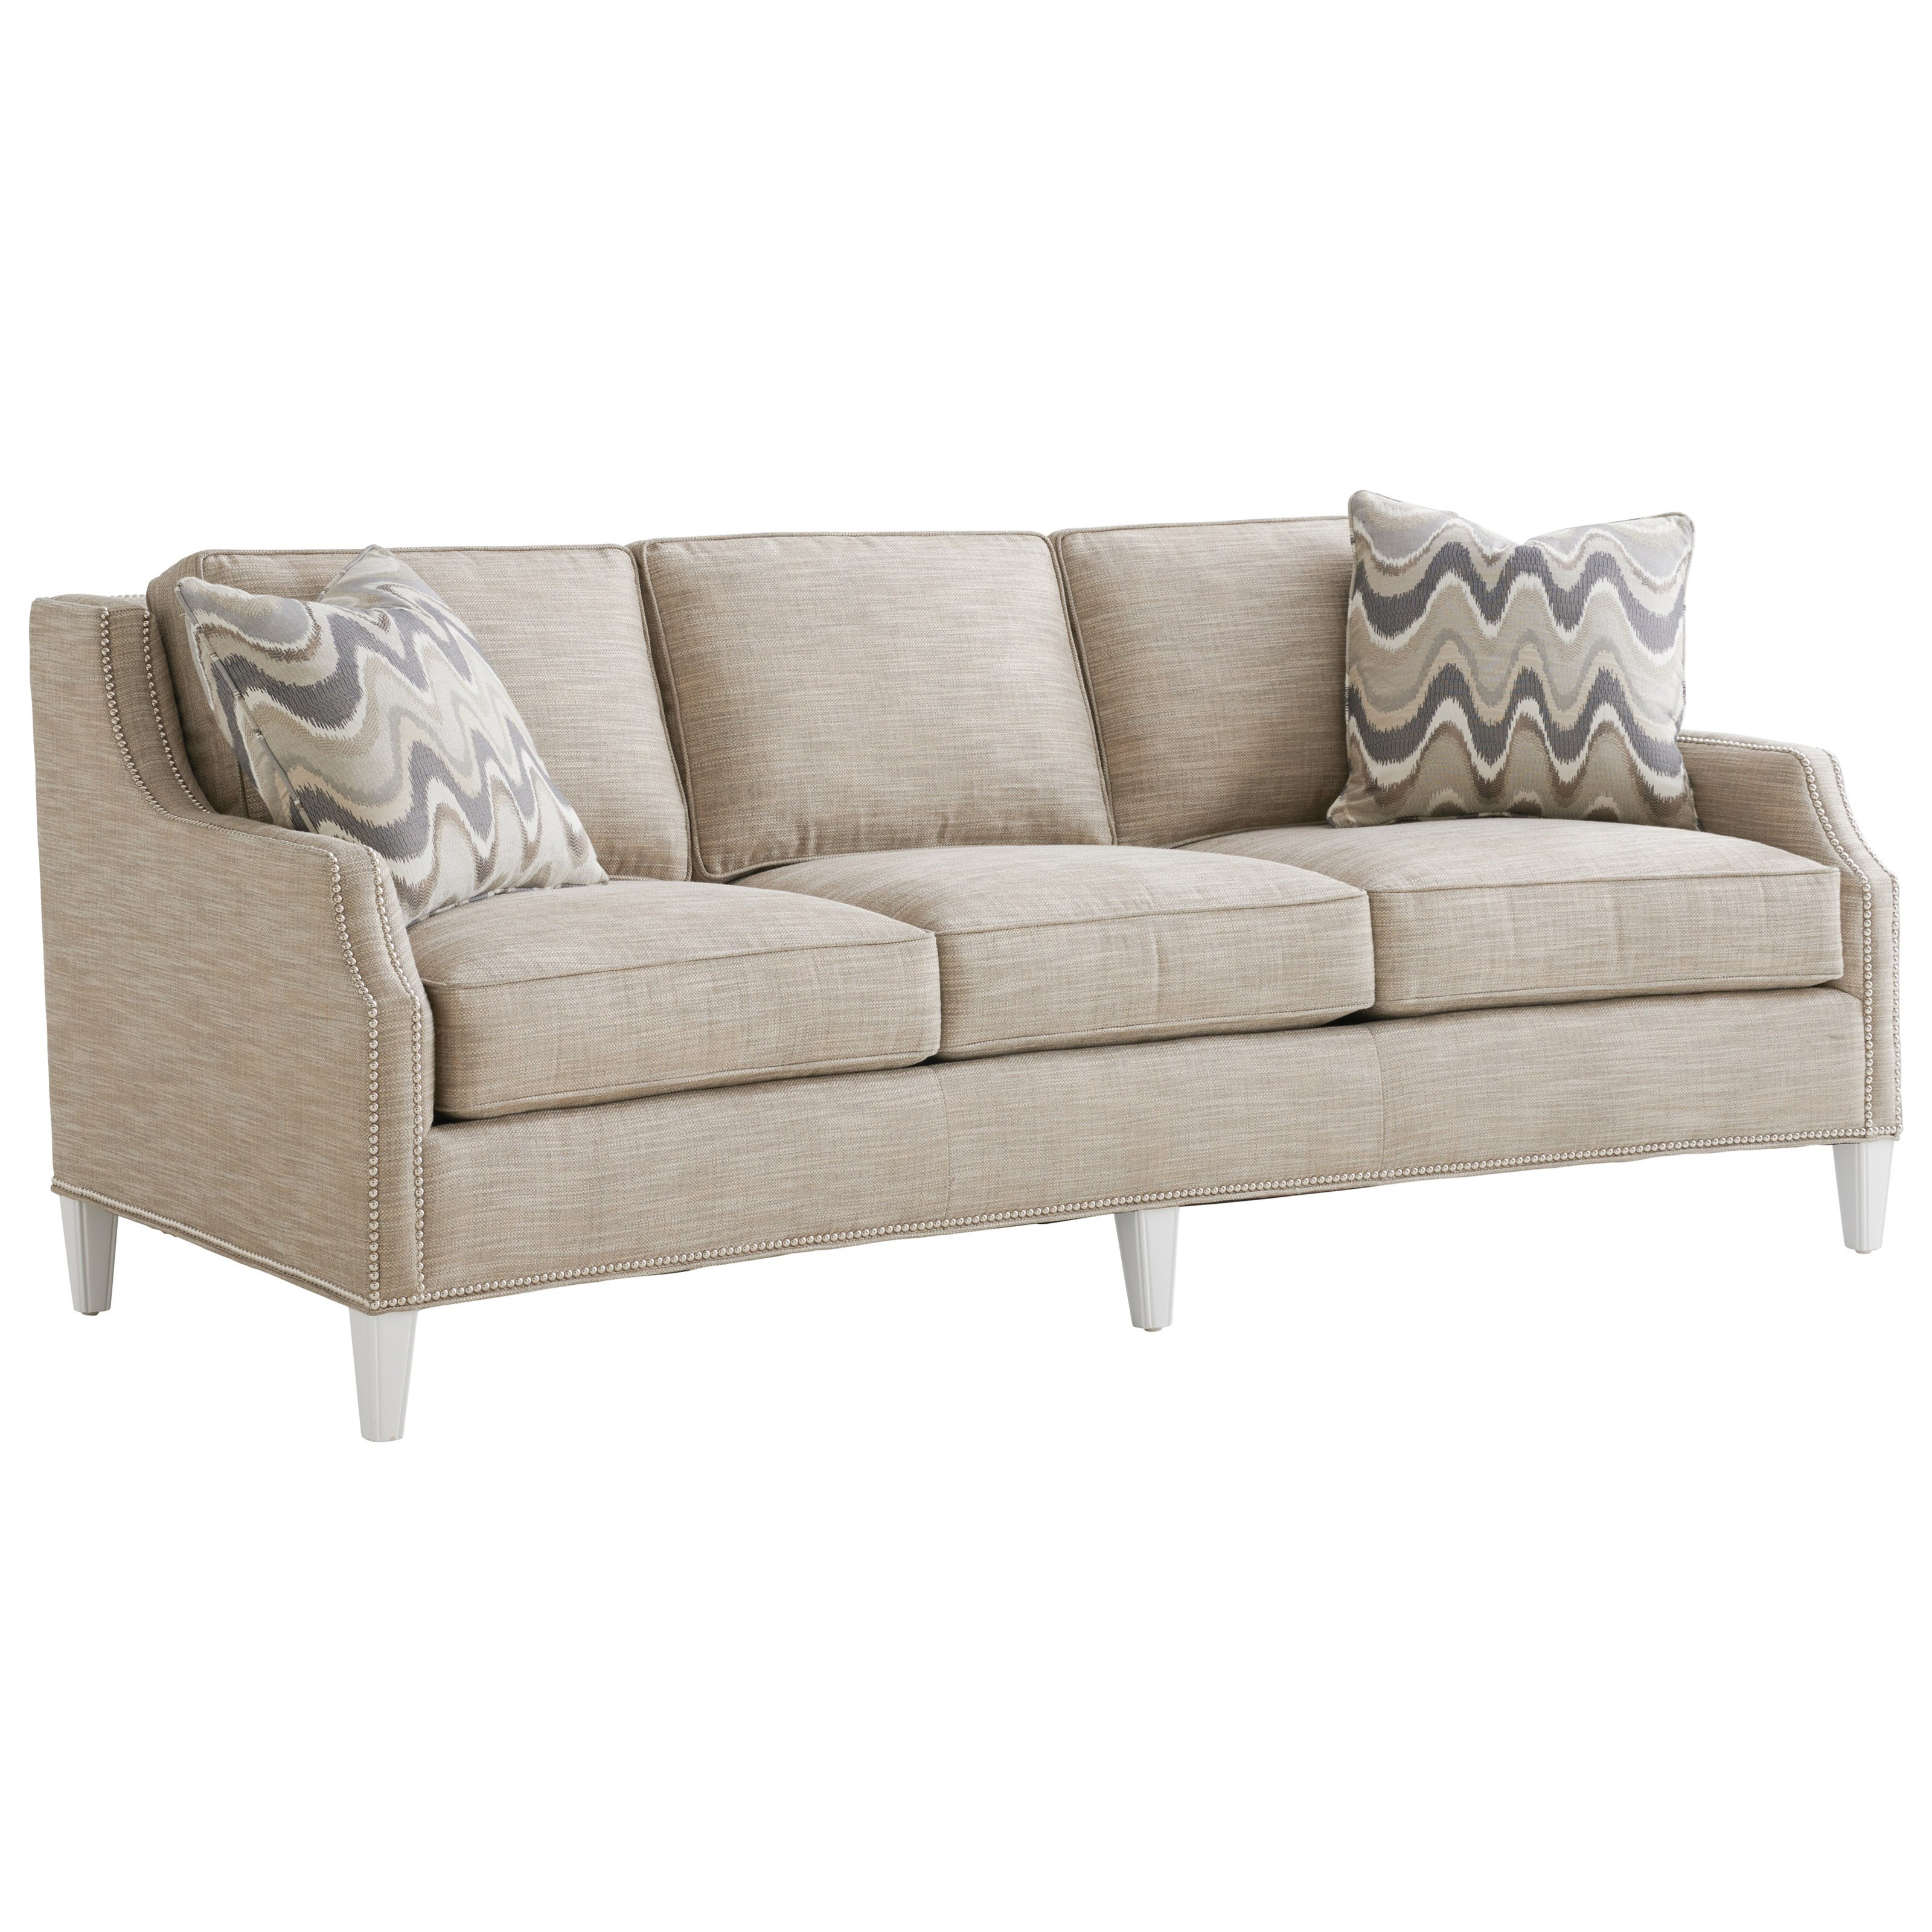 Avondale Signac Sofa by Lexington at Johnny Janosik